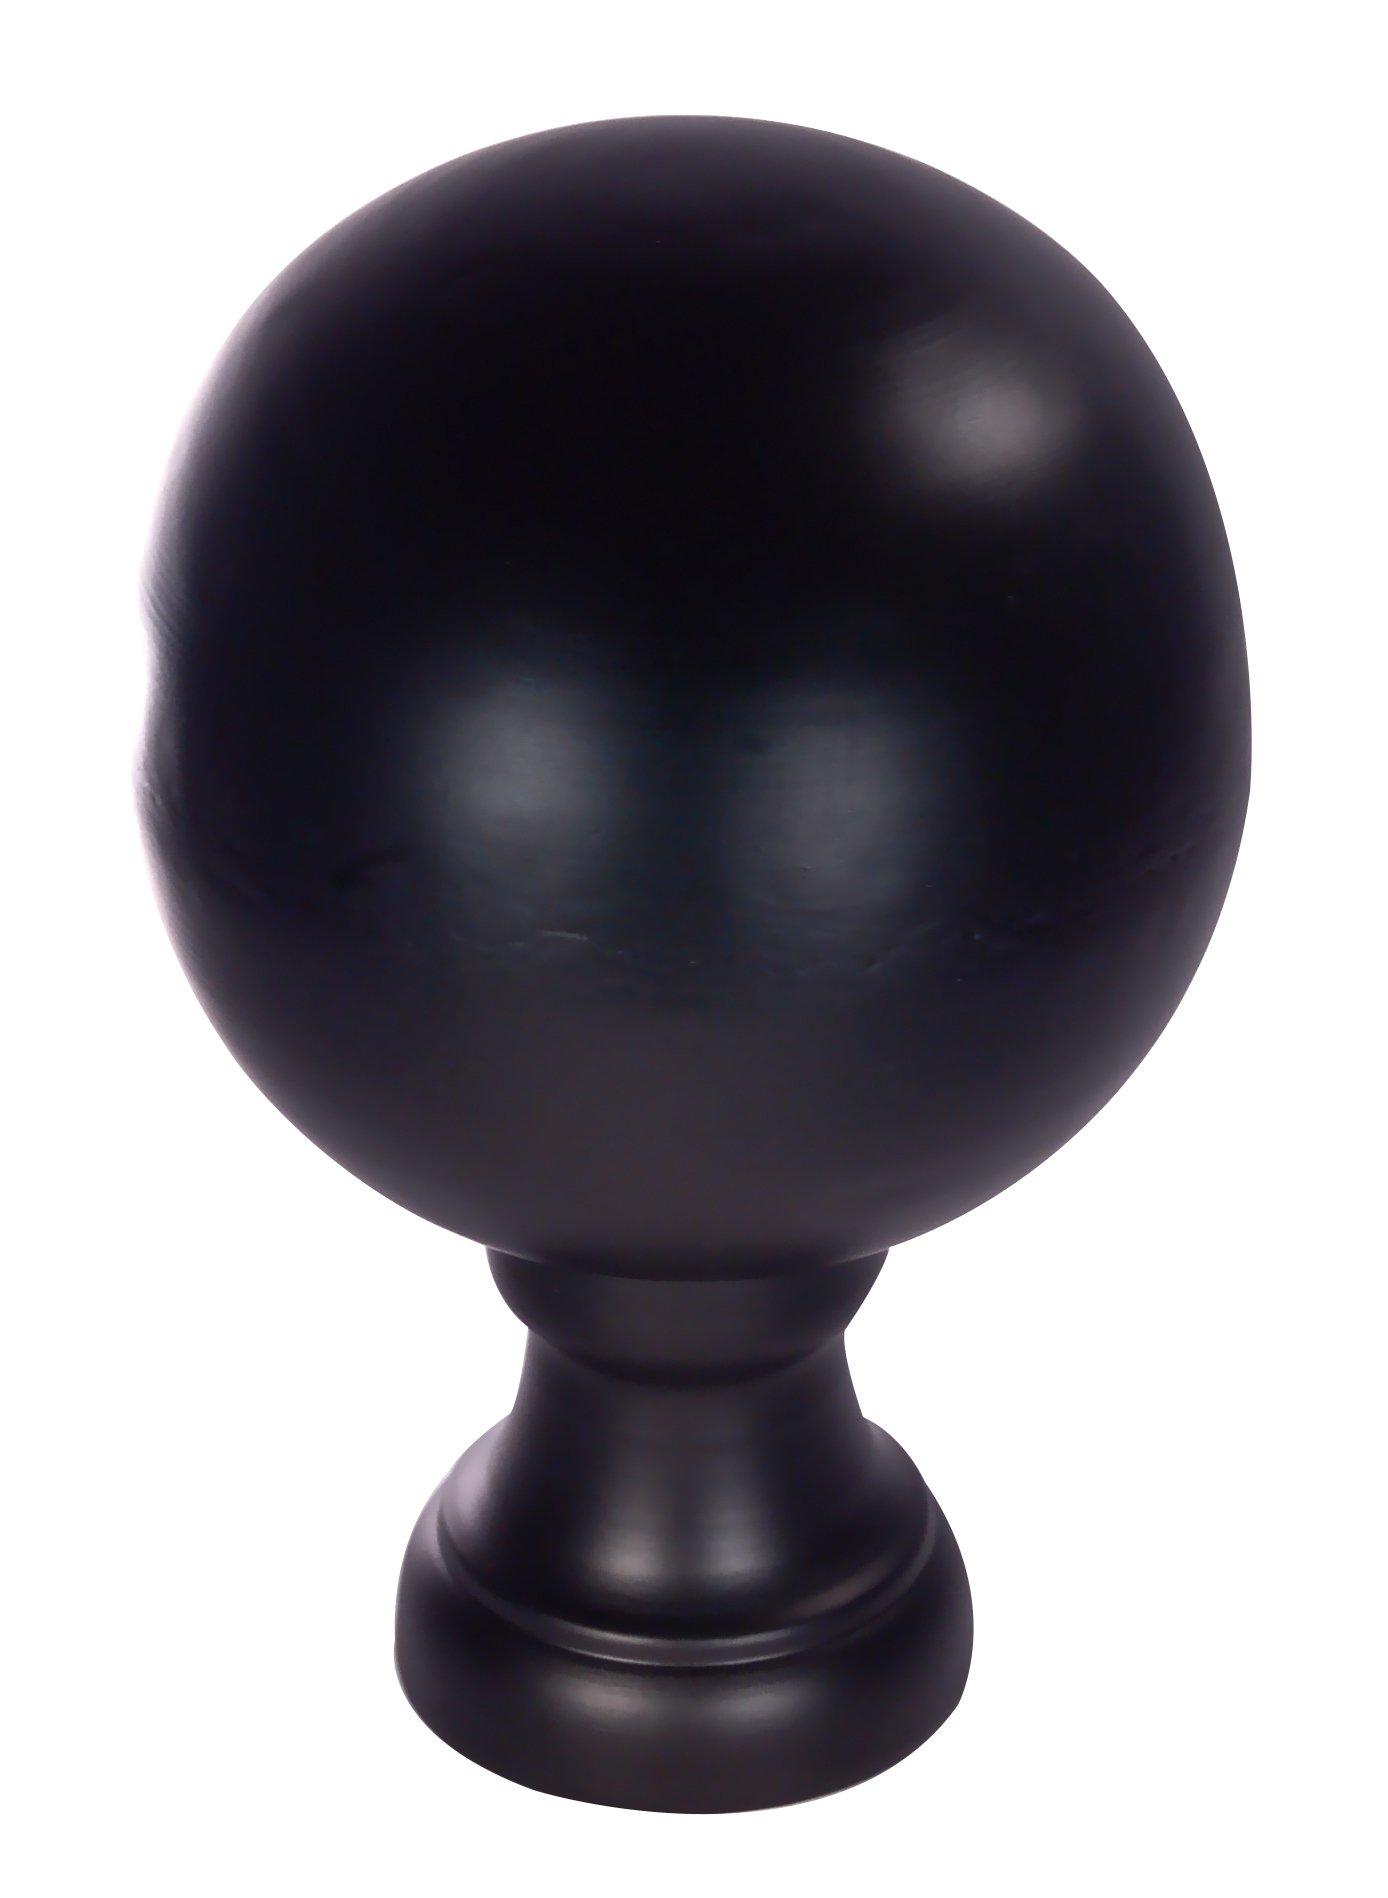 Dalvento Small Londoner Finial- Black Matte by Dalvento (Image #1)